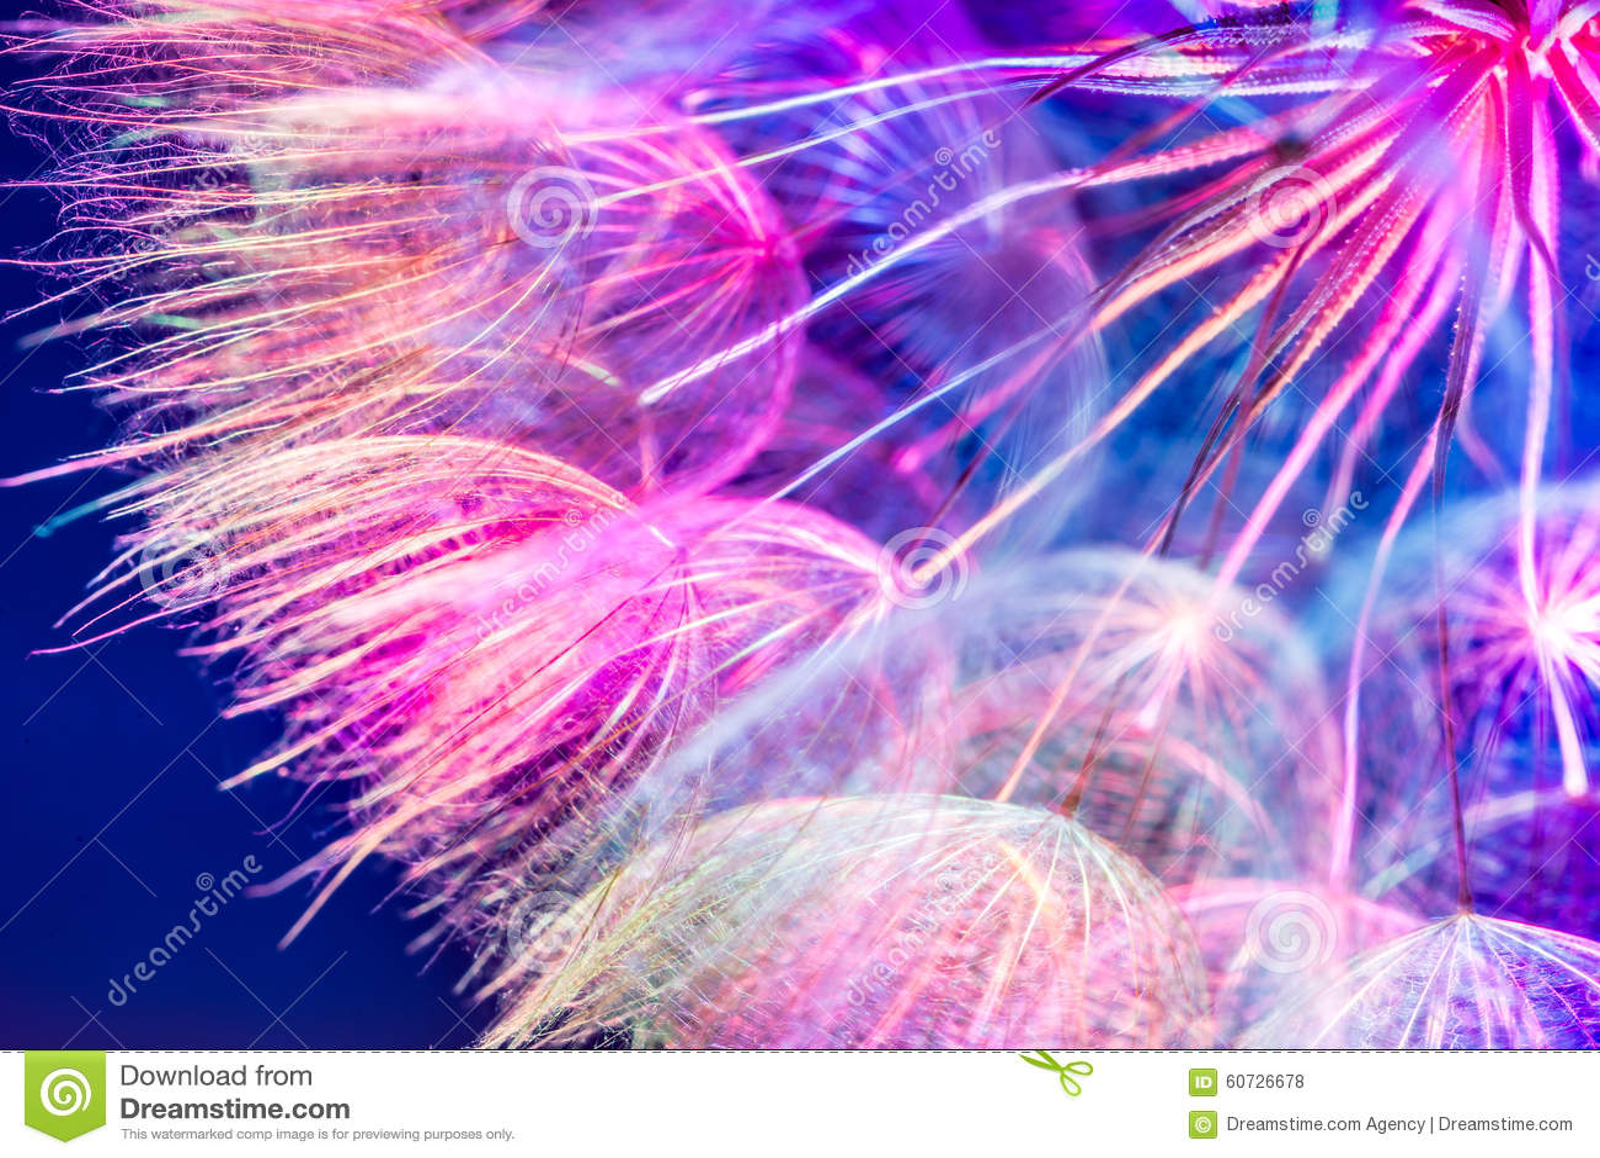 Colorful Pink Pastel Background - vivid abstract dandelion flowe